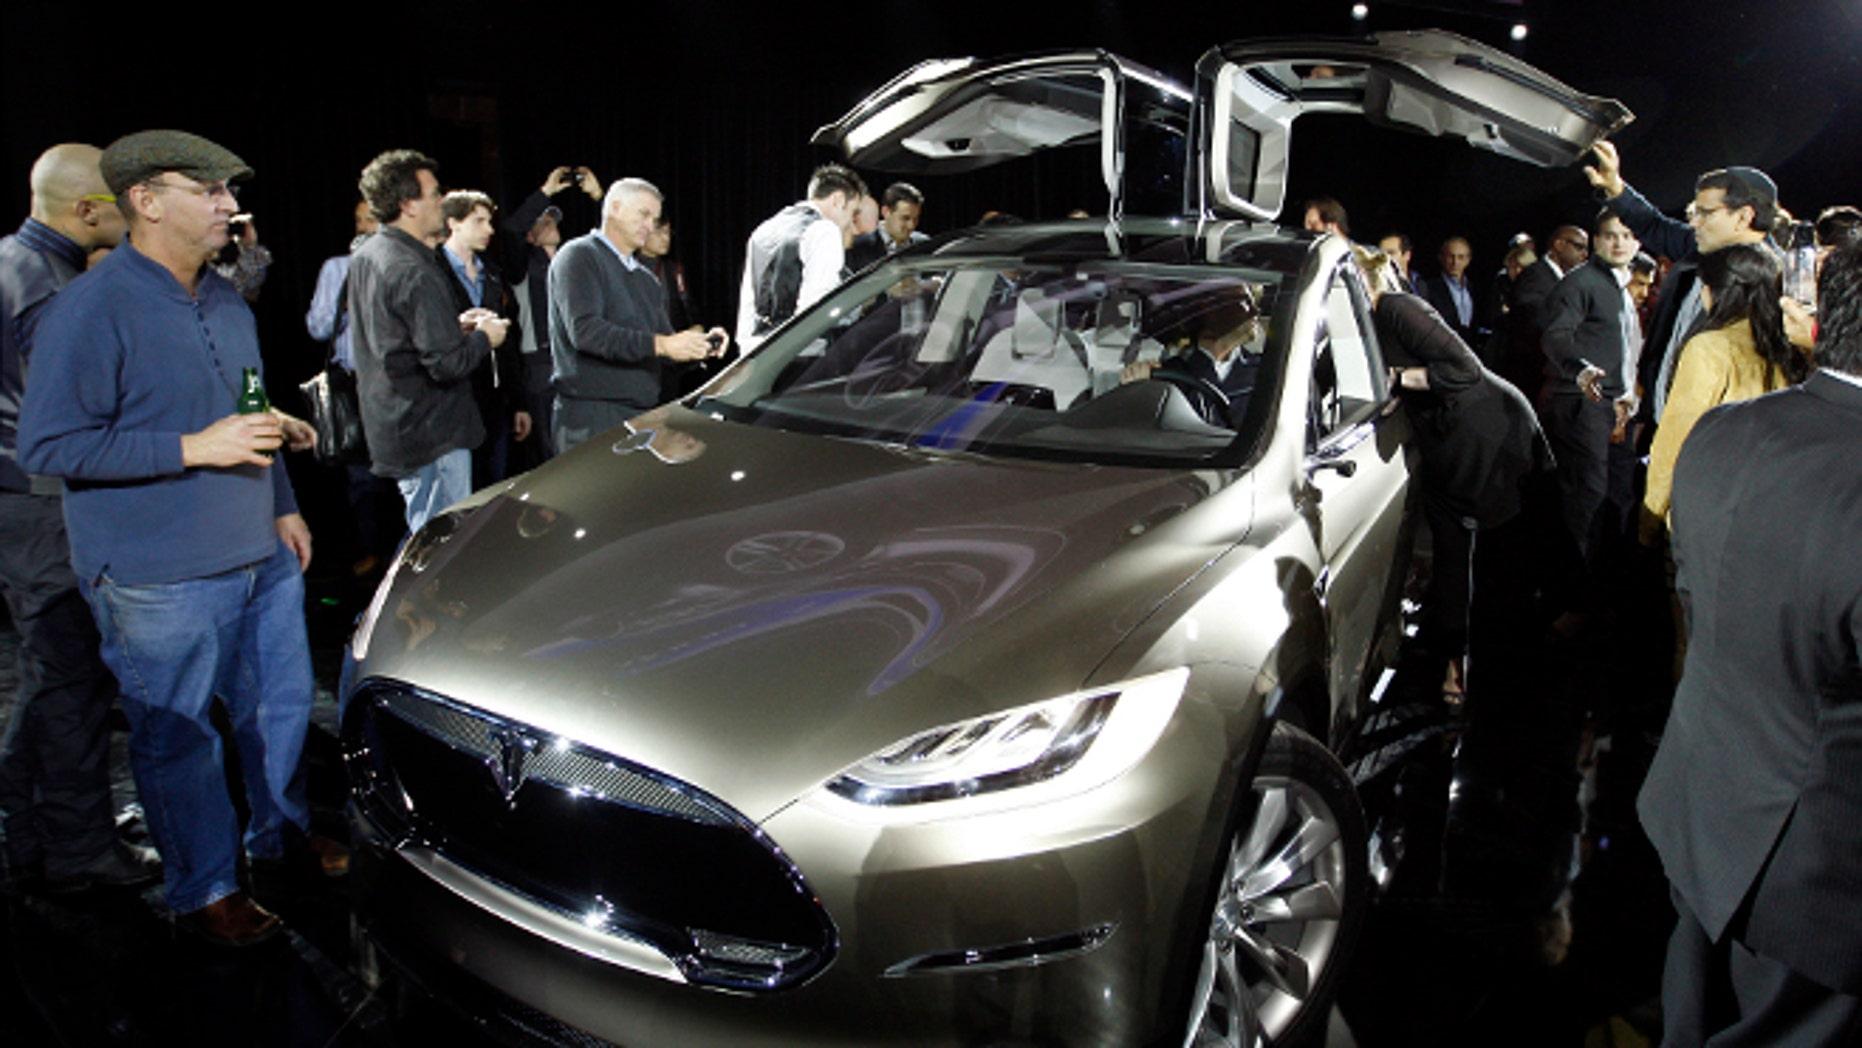 FILE: February 9, 2012: The Tesla Motors Model X at the company's design studio in Hawthorne, Calif. o